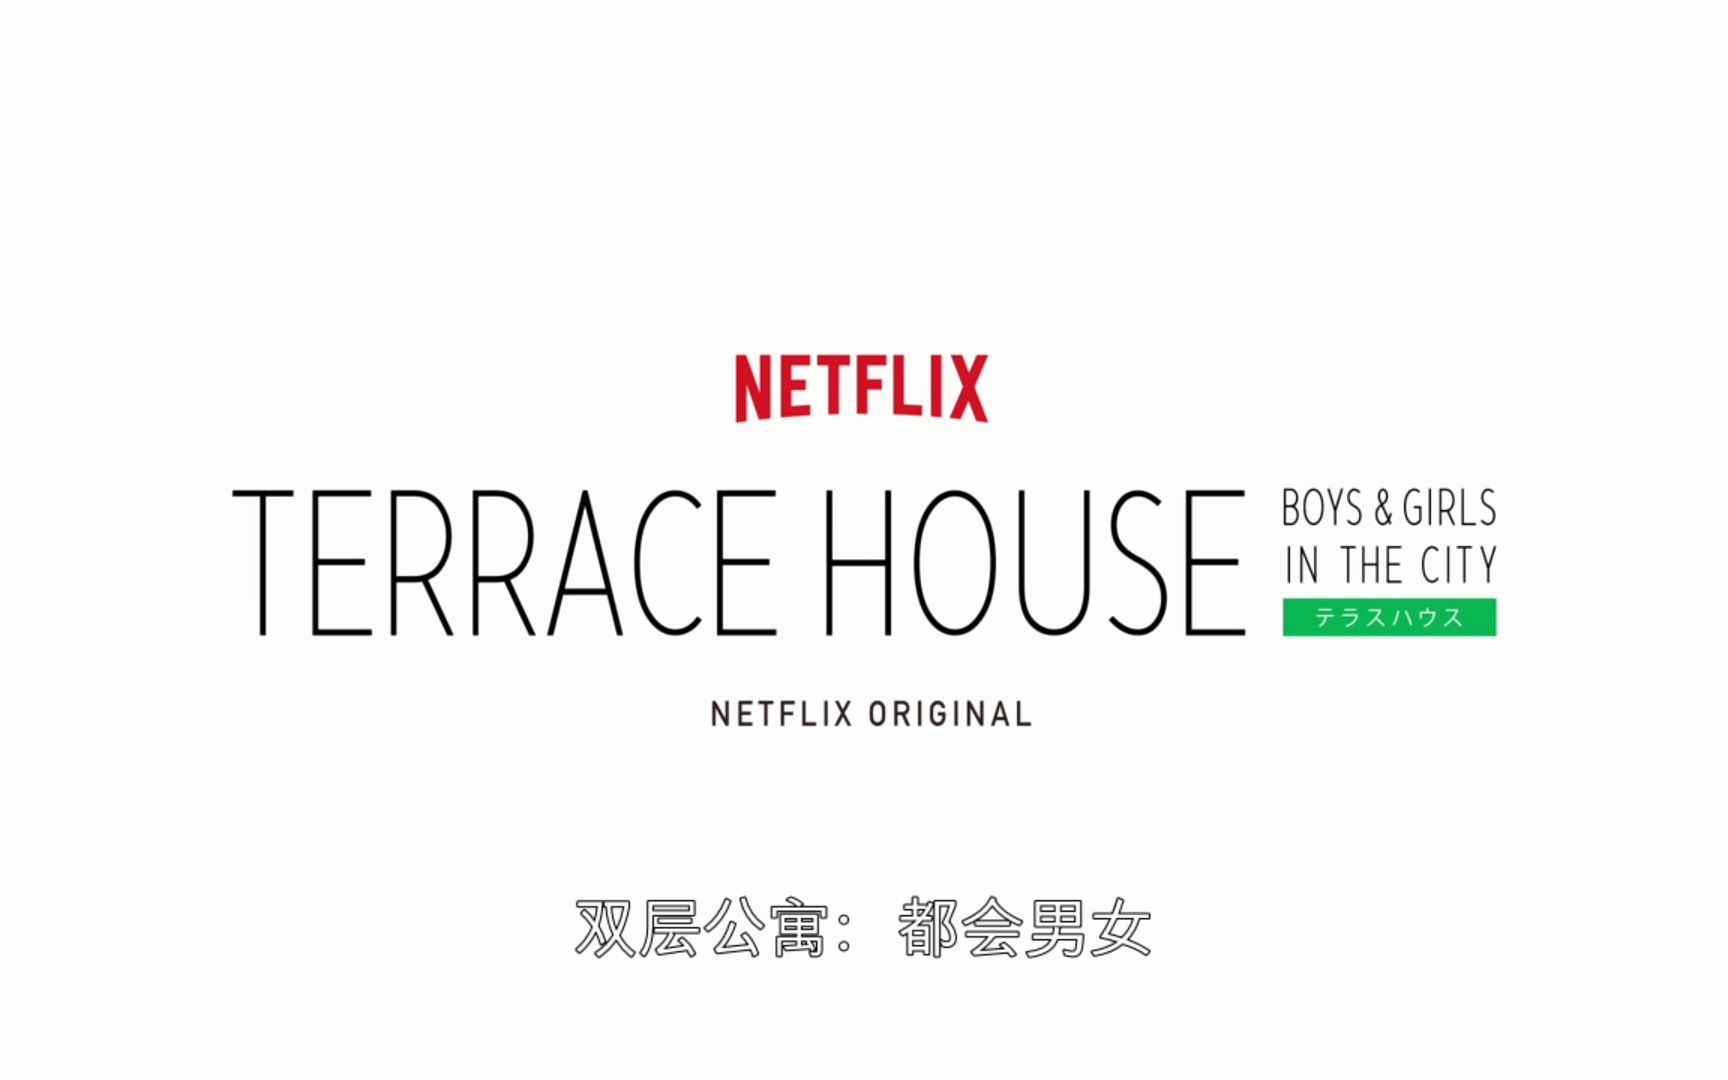 Terrace house bilibili for Terrace house netflix